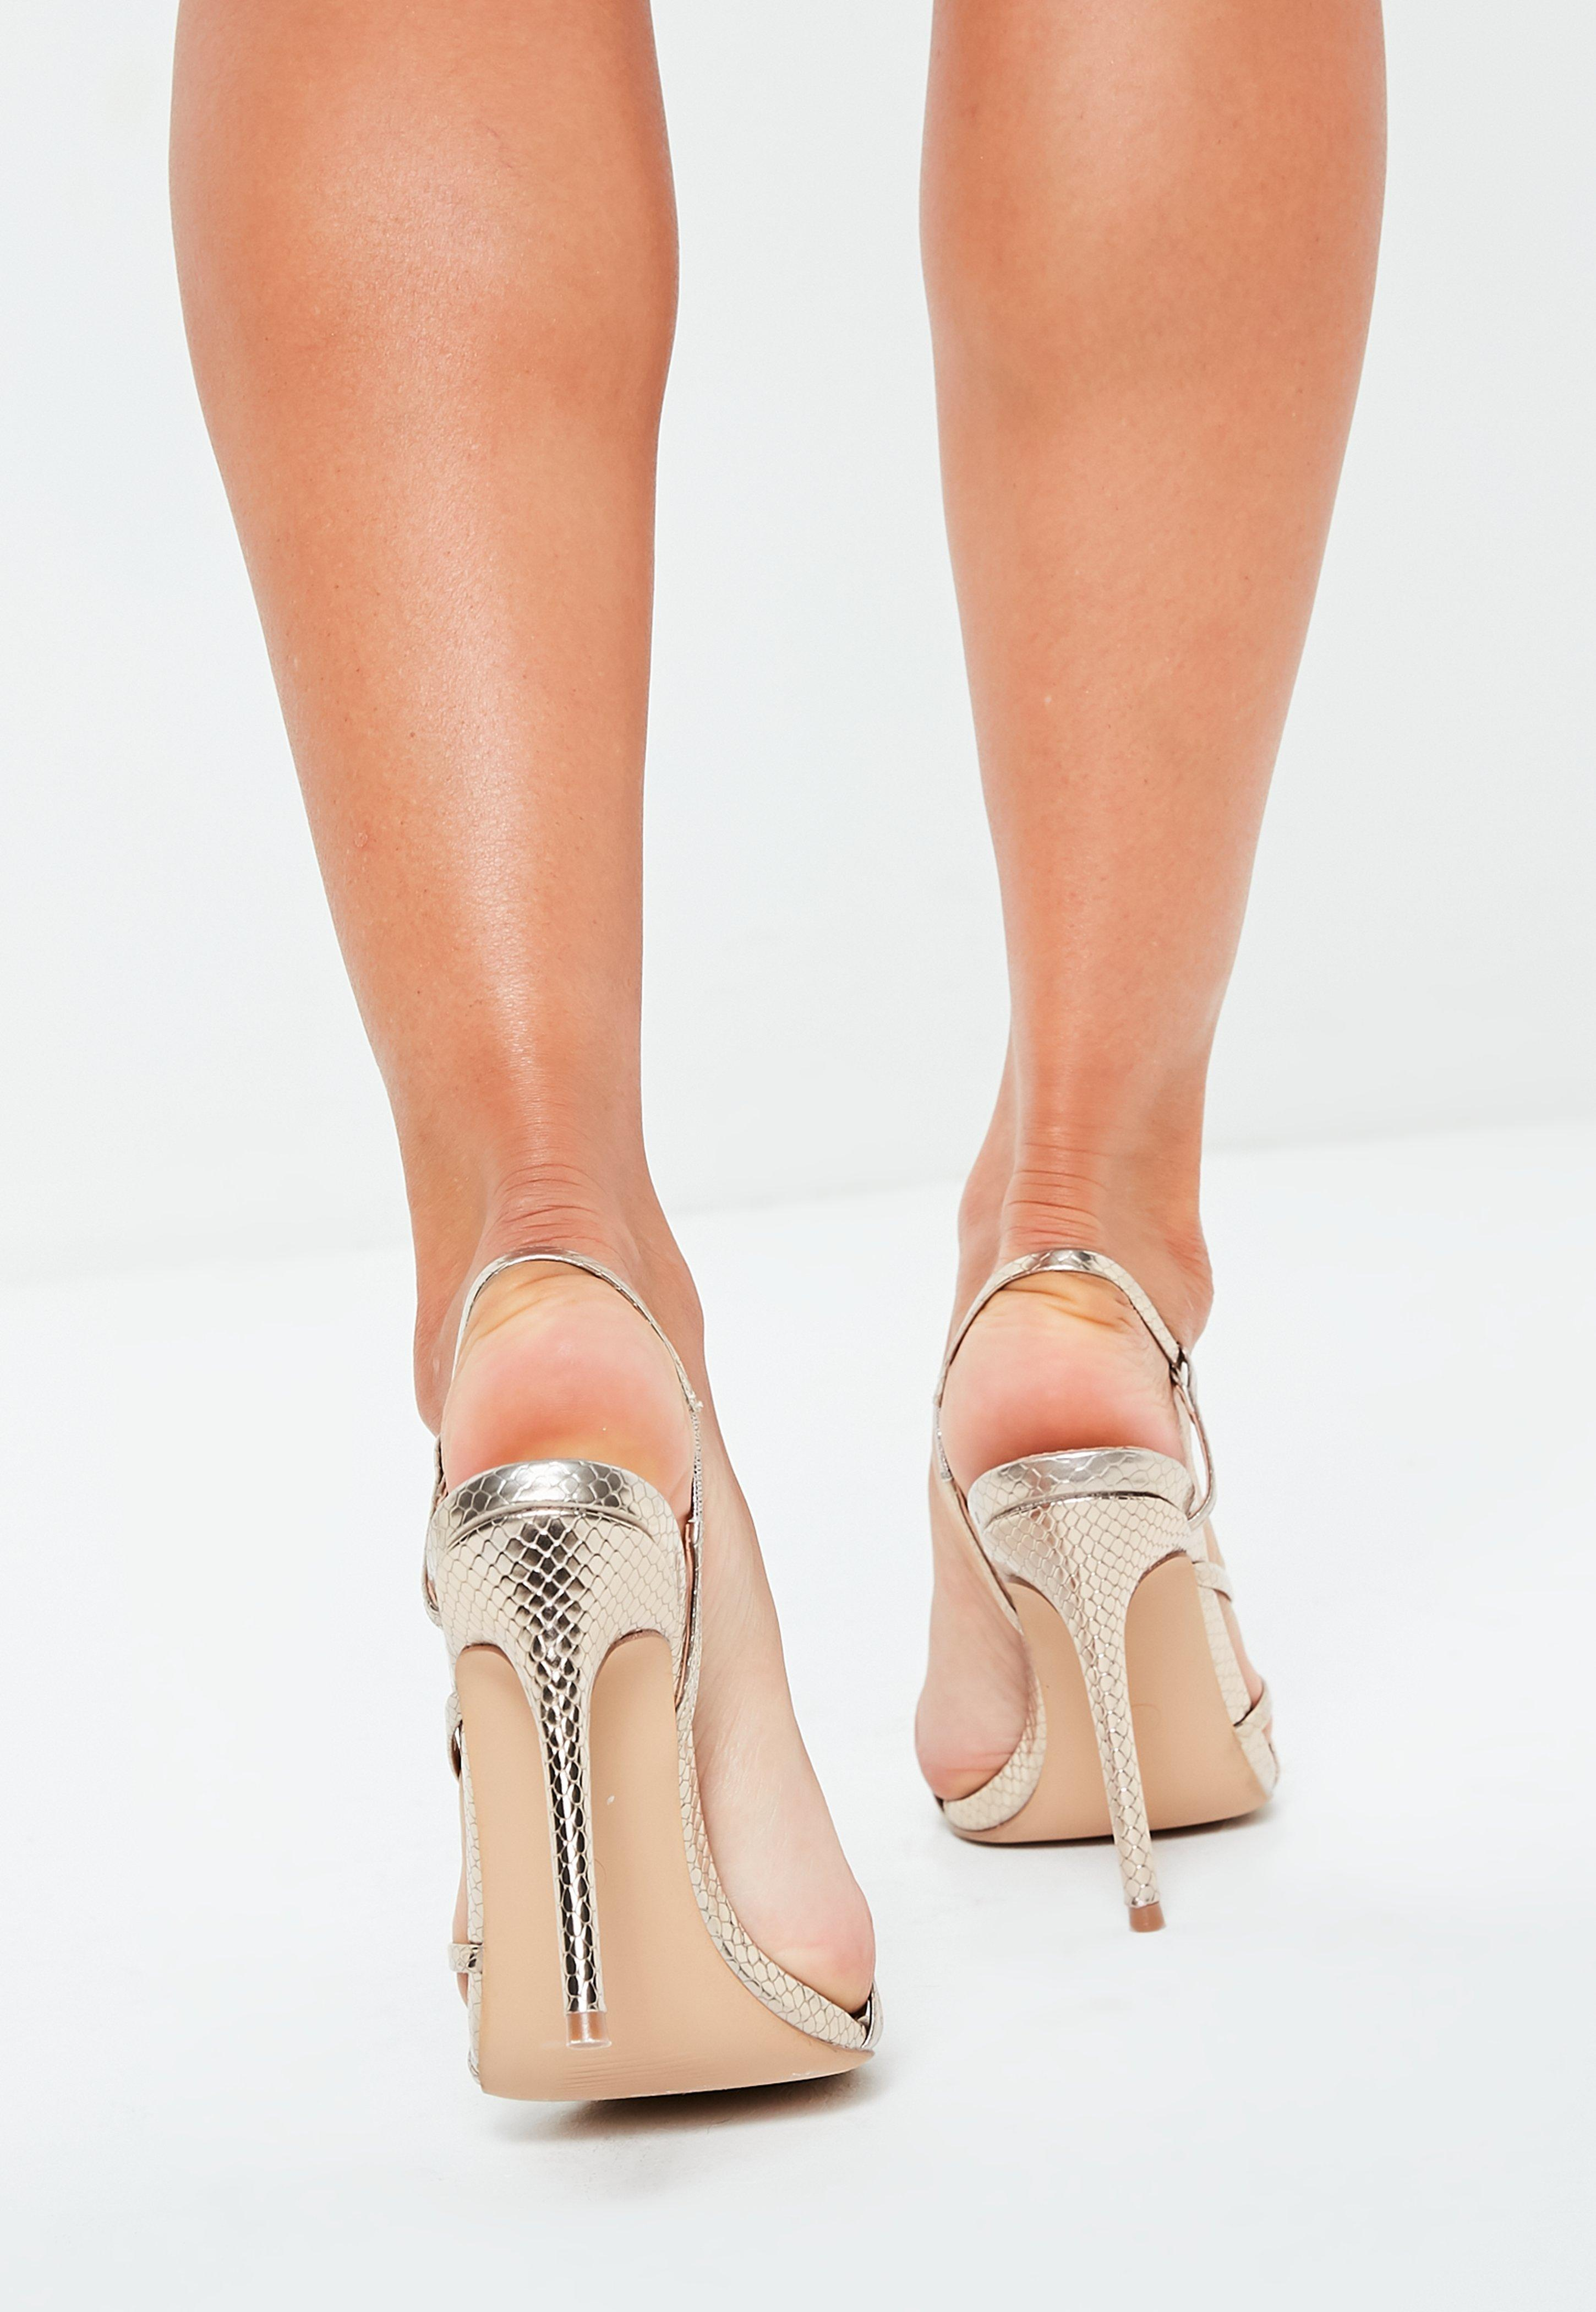 a396528bbbcc13 Lyst - Missguided Gold Asymmetric Multi Strap Heel Sandals in Metallic